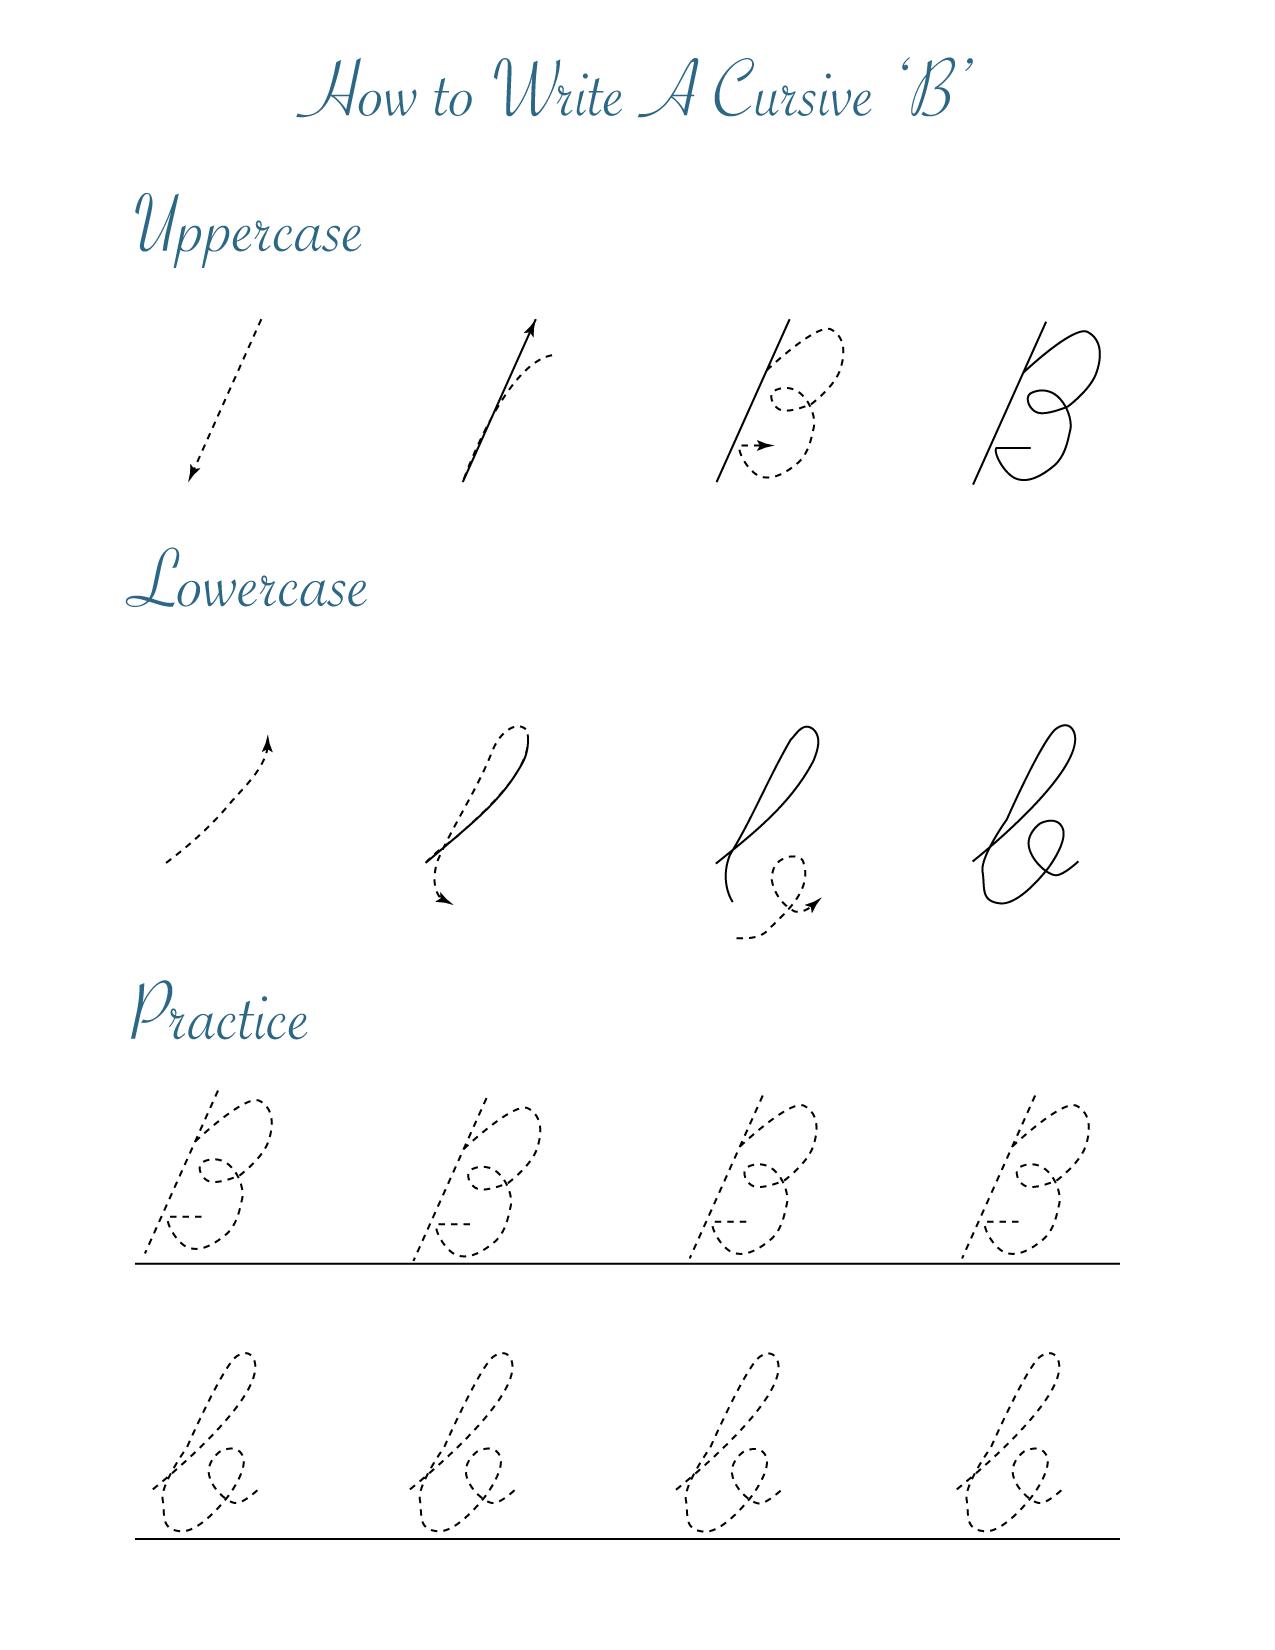 How to write a cursive B